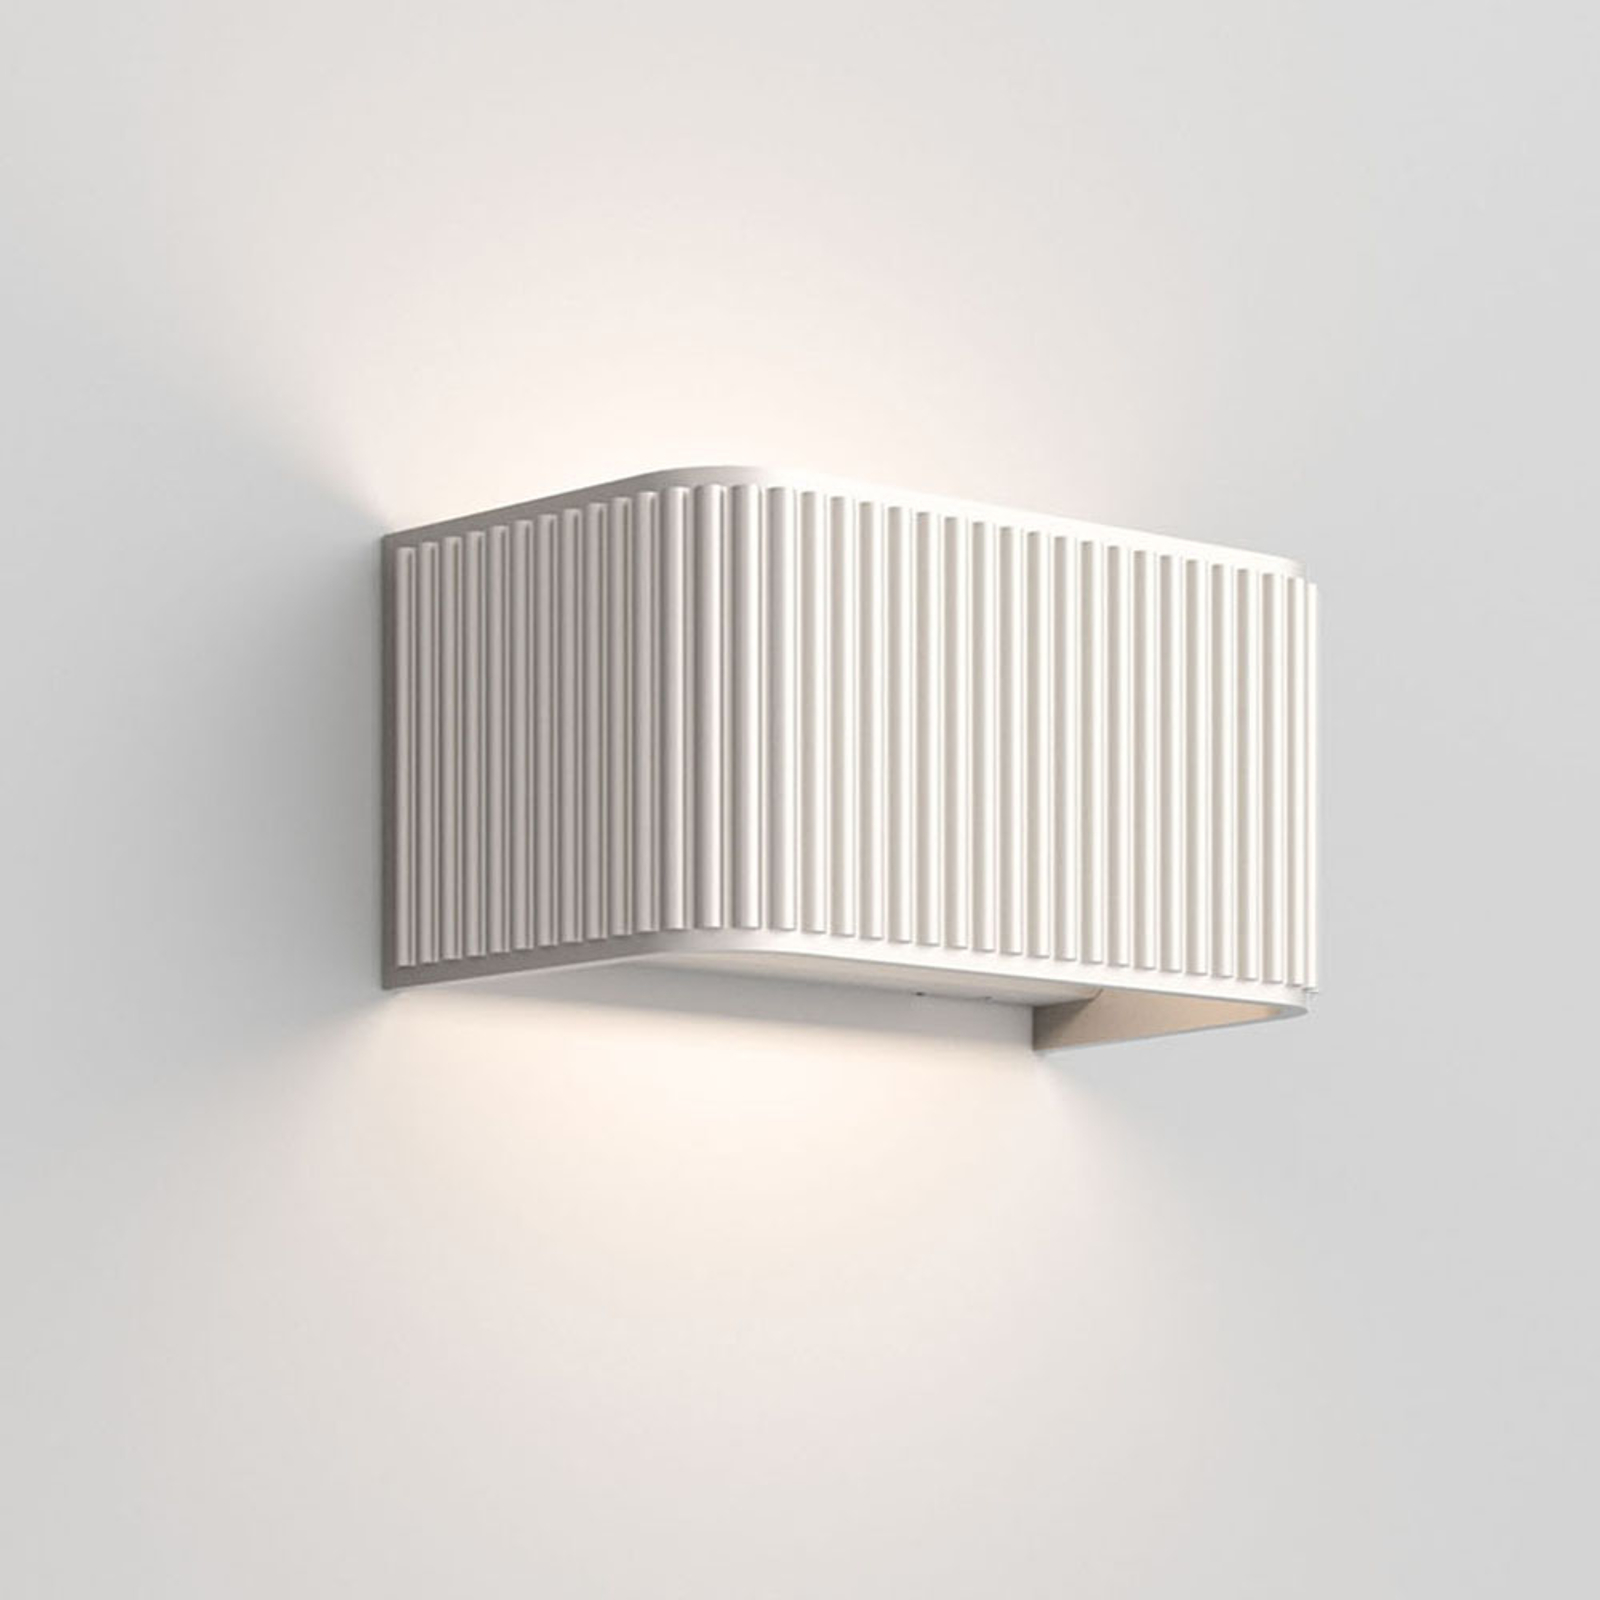 Rotaliana Dresscode W1 LED-seinävalo, kerma 2700 K